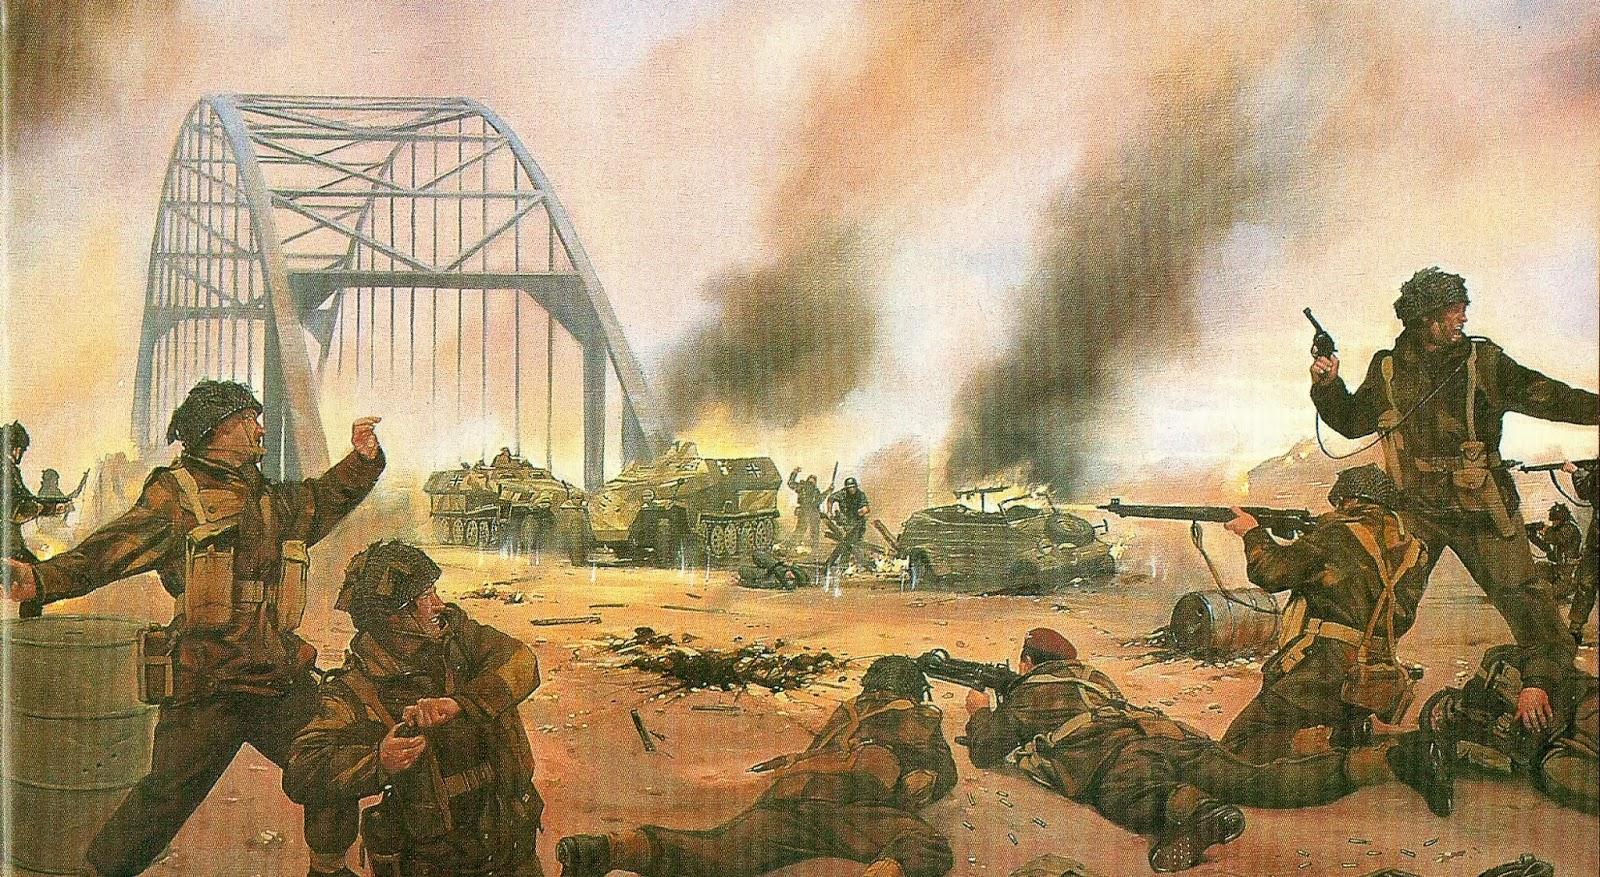 [Imagen: Lucha+en+el+puente+de+Arnhem..jpg]